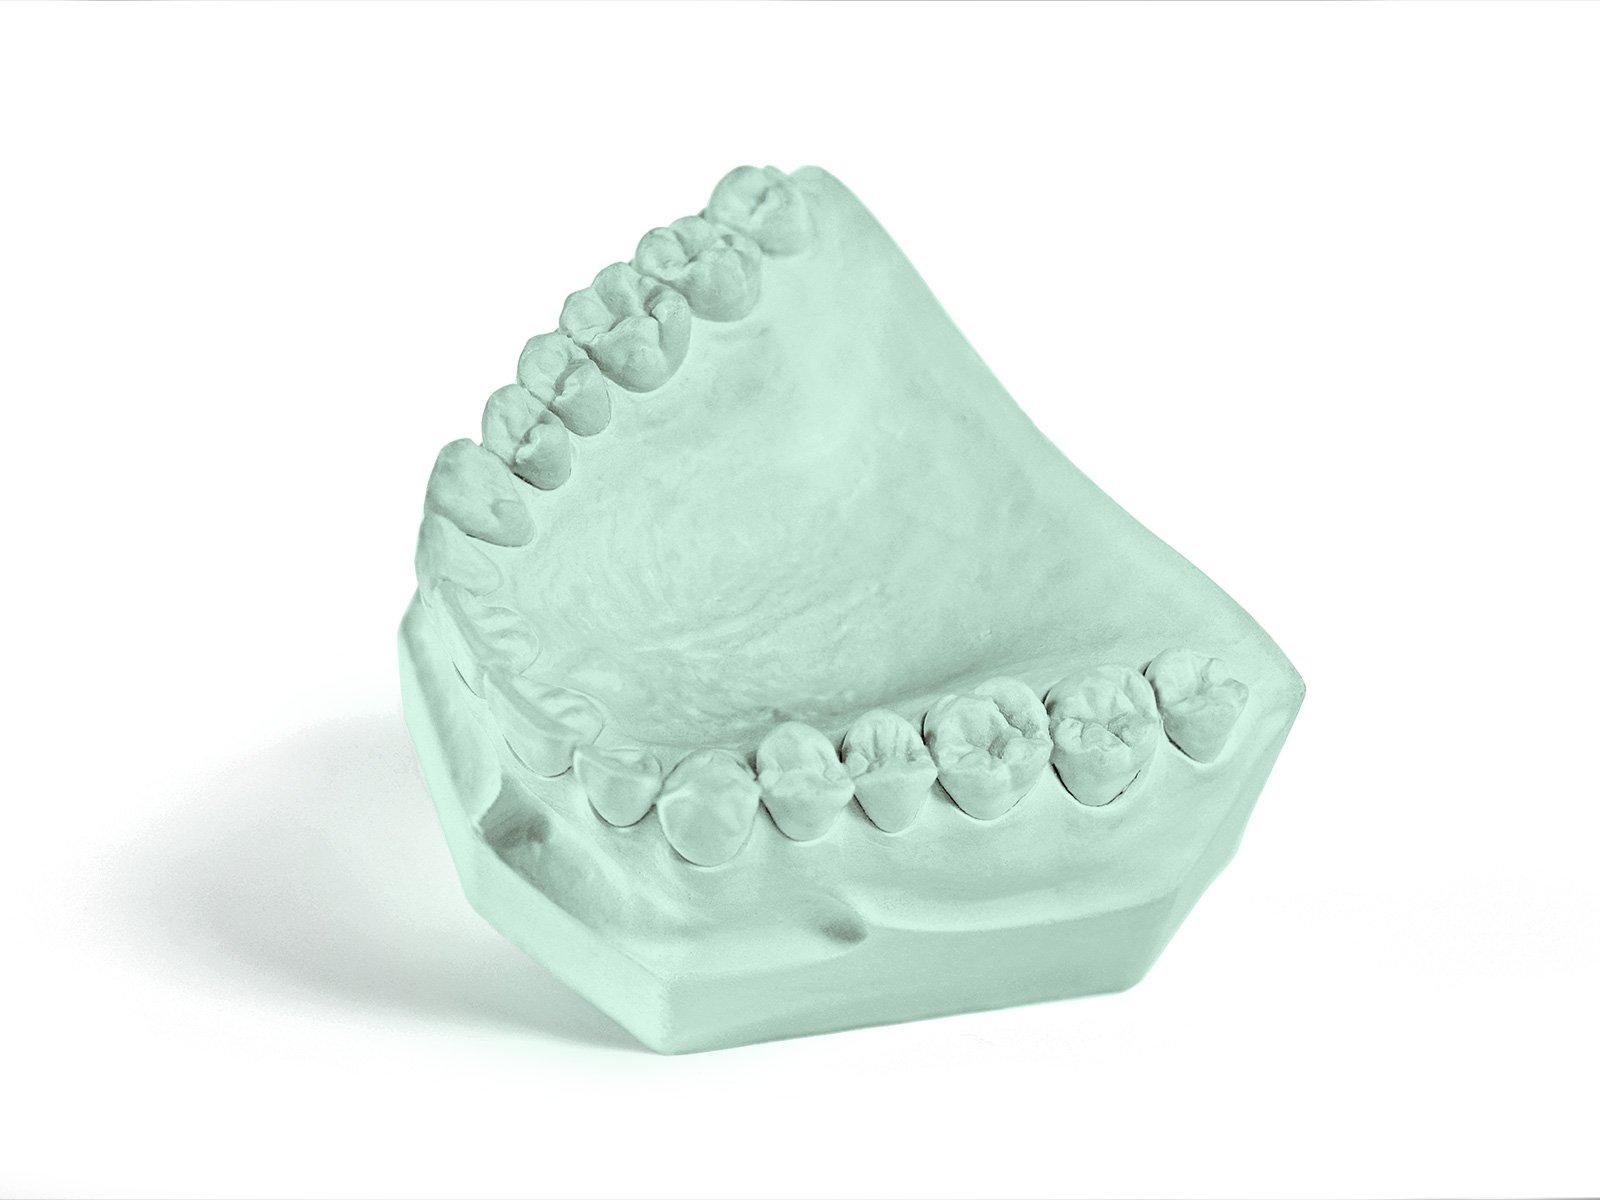 Garreco 1352525 Dental Excalibur, Type IV Die Stone, 25 lb Carton, Green